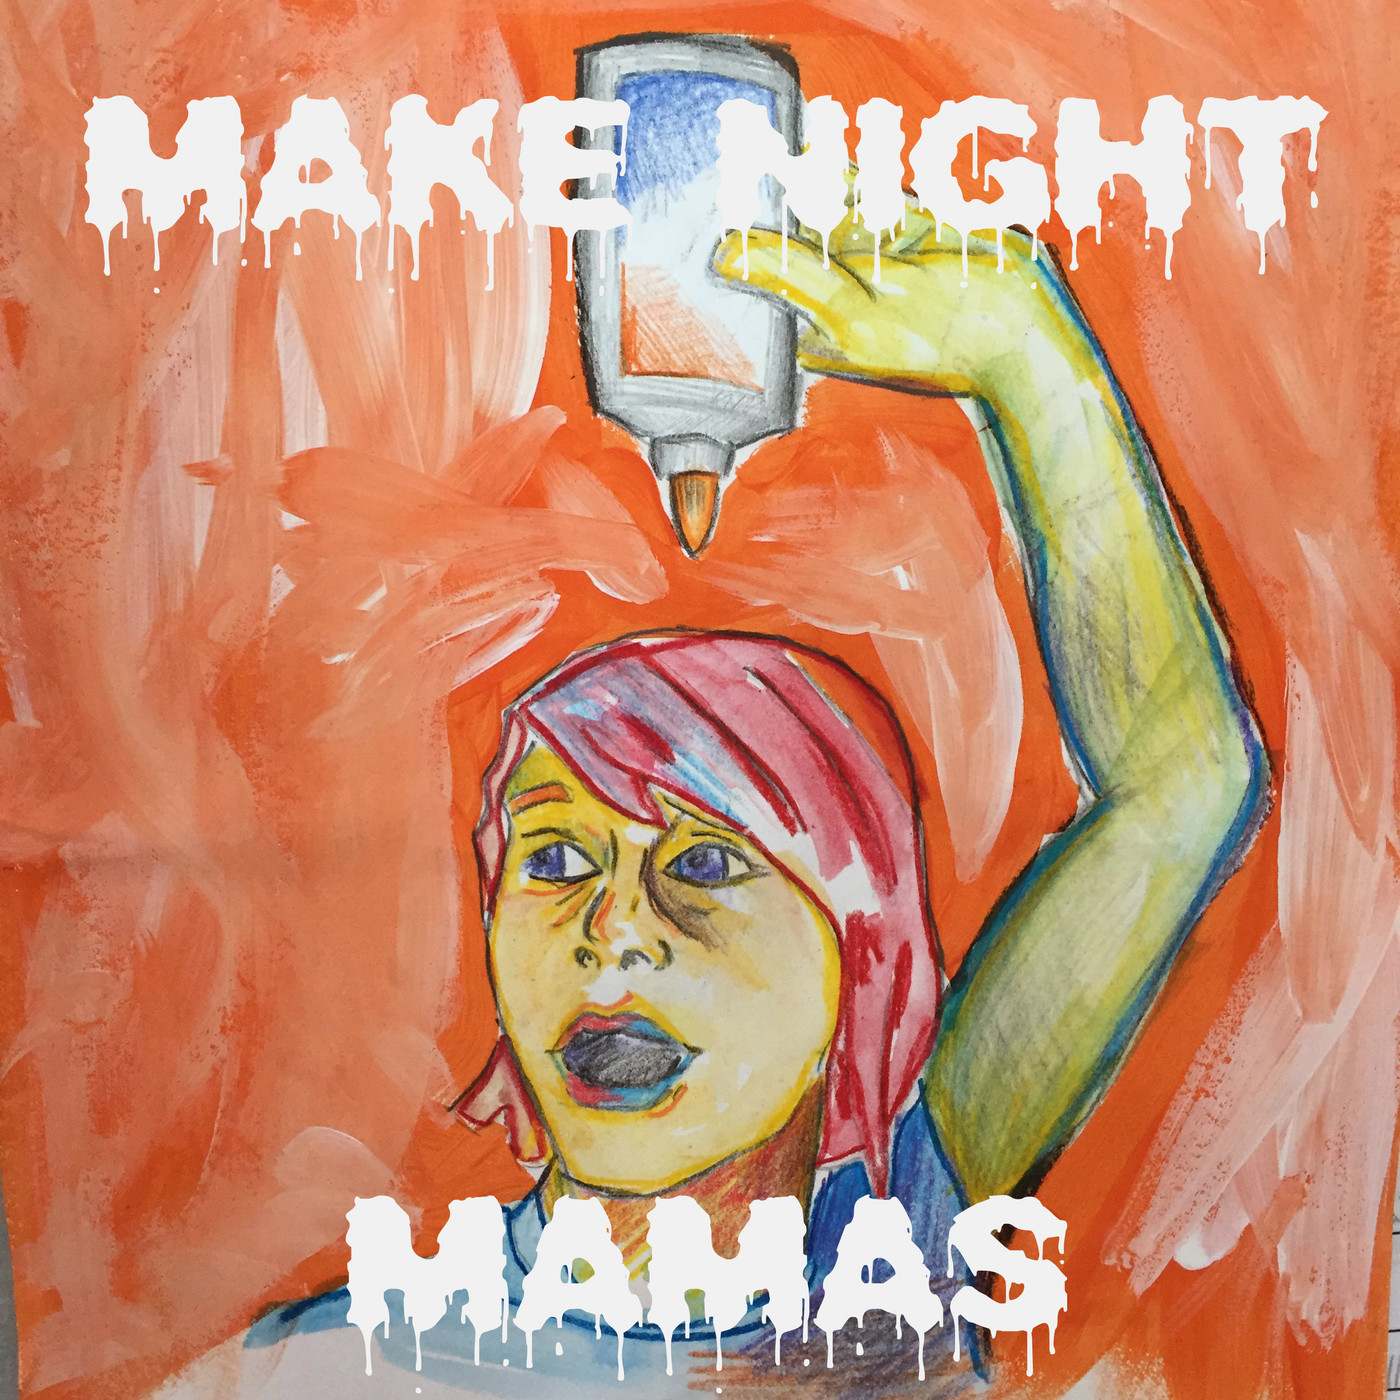 MAKE NIGHT MAMAS CLASSES